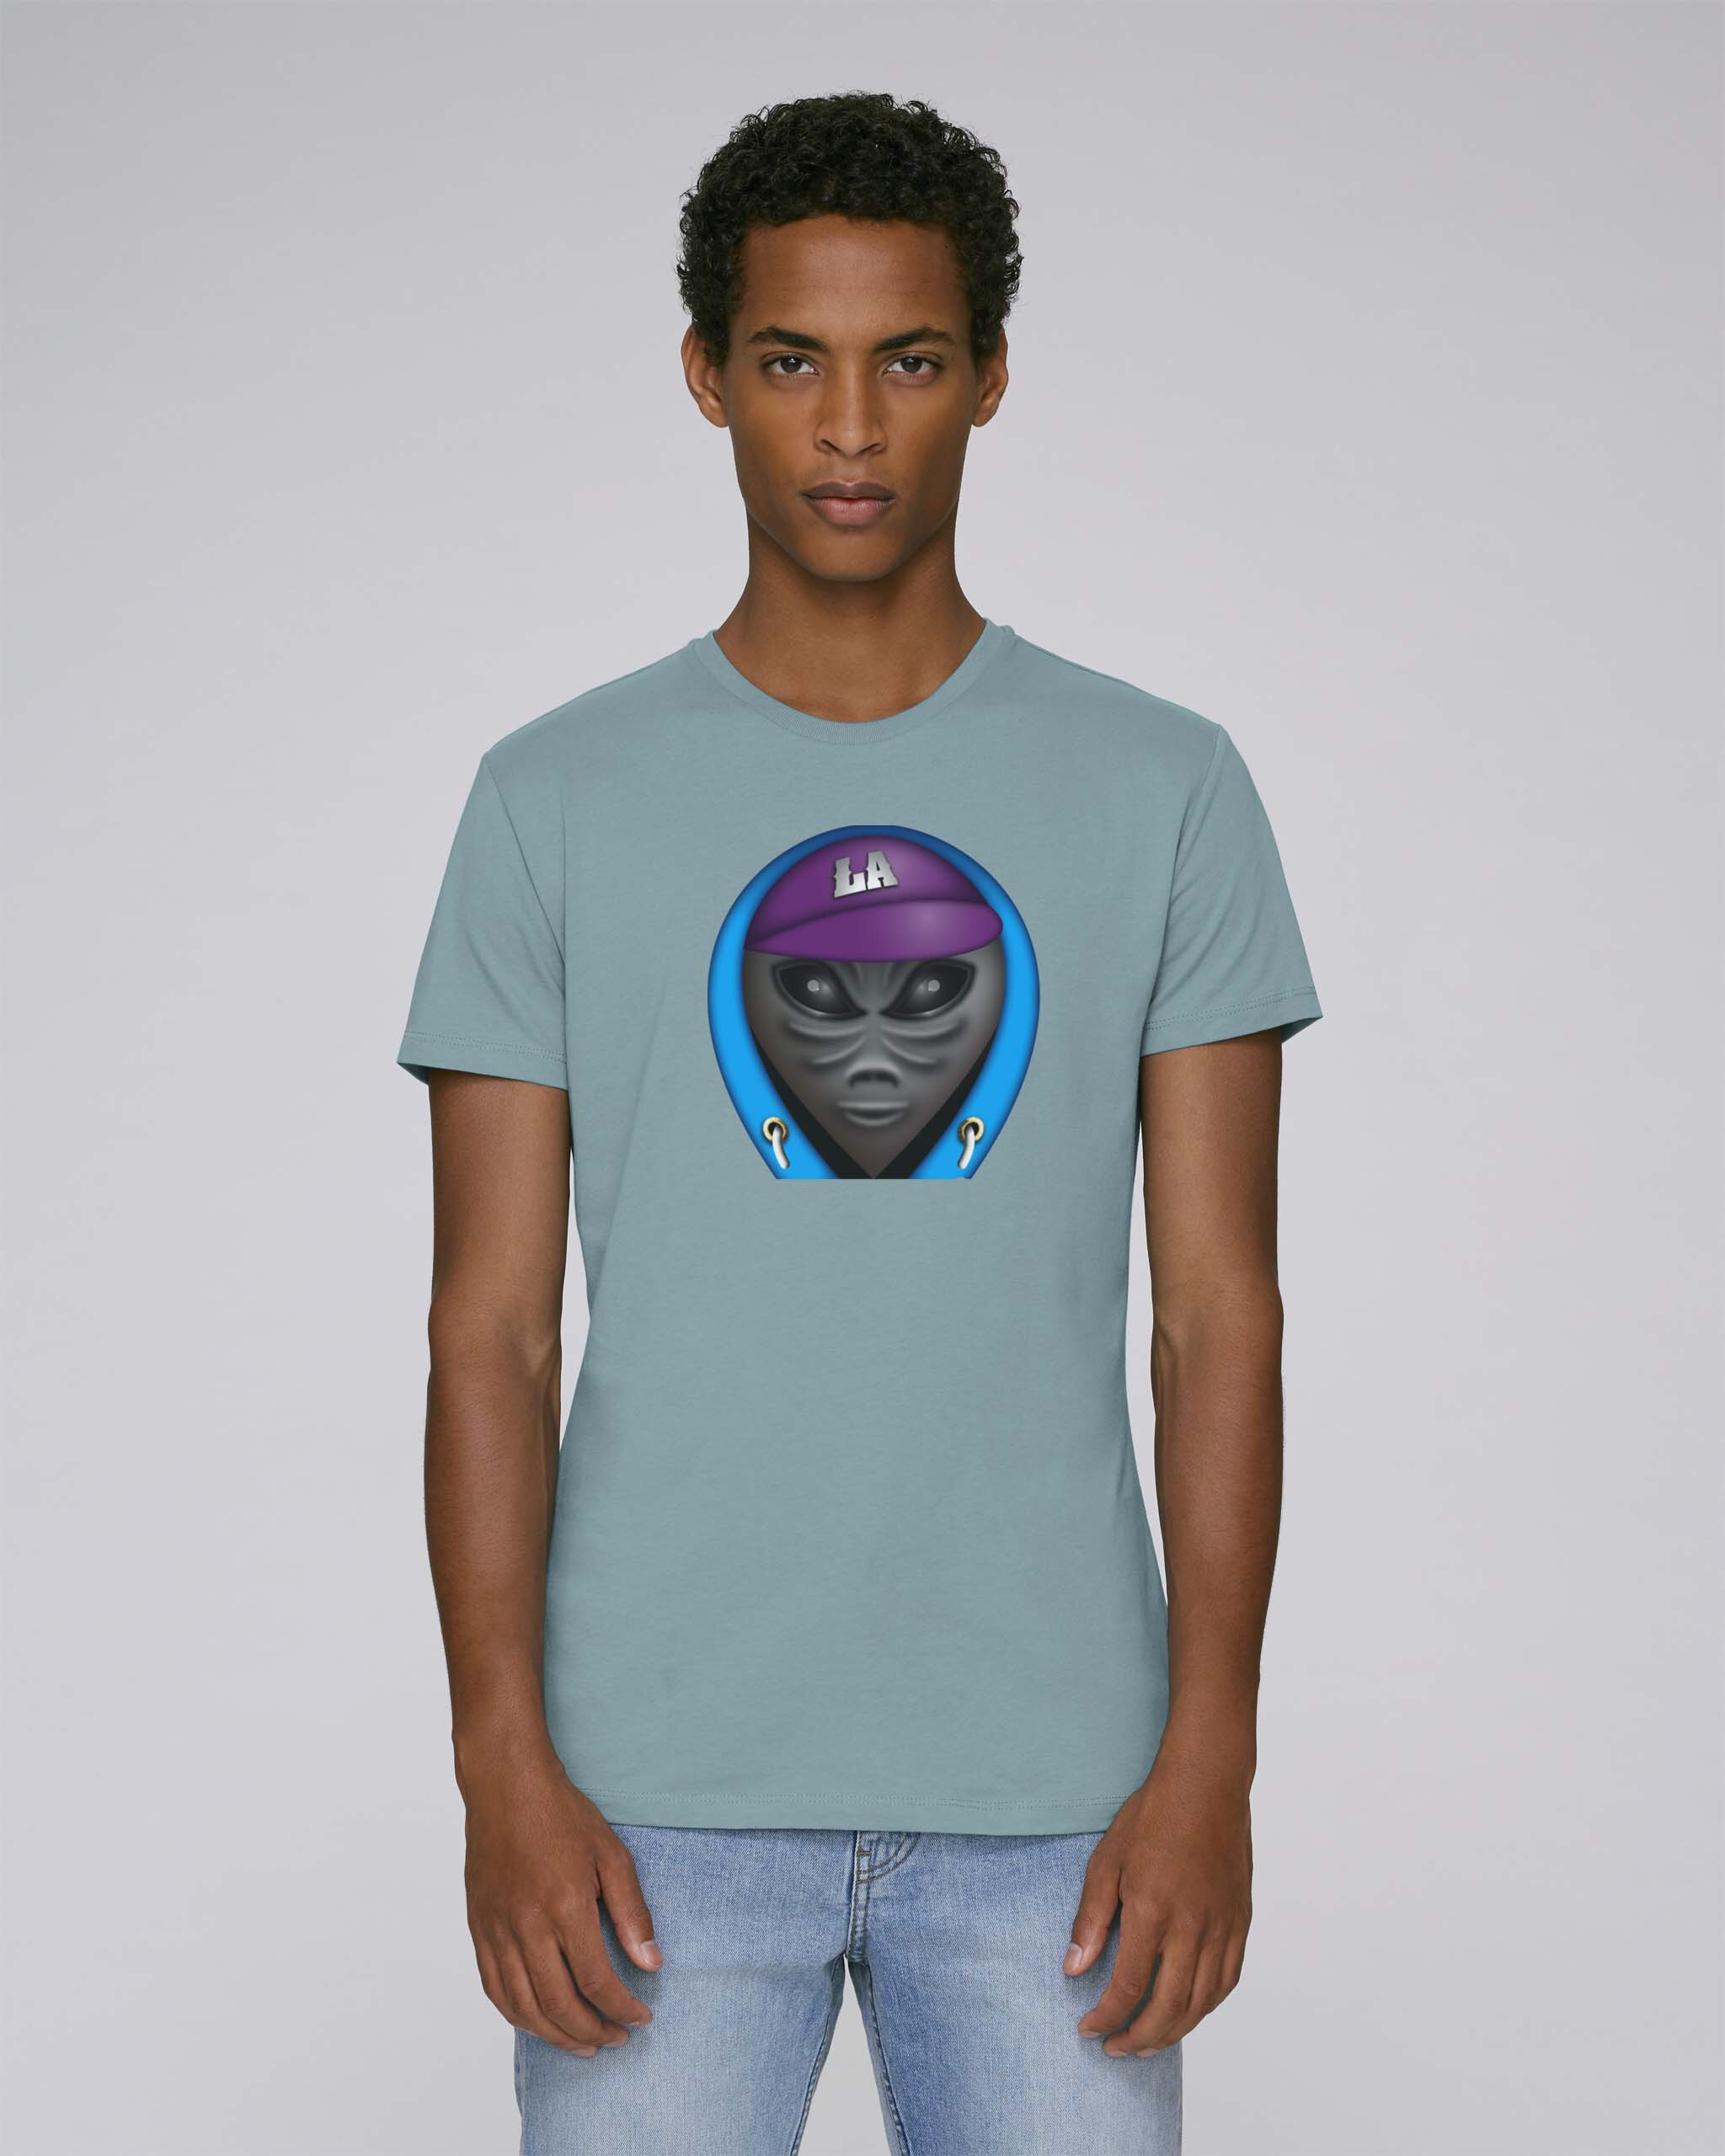 T-Shirt Bio Vert Clair Homme - Ovni tee